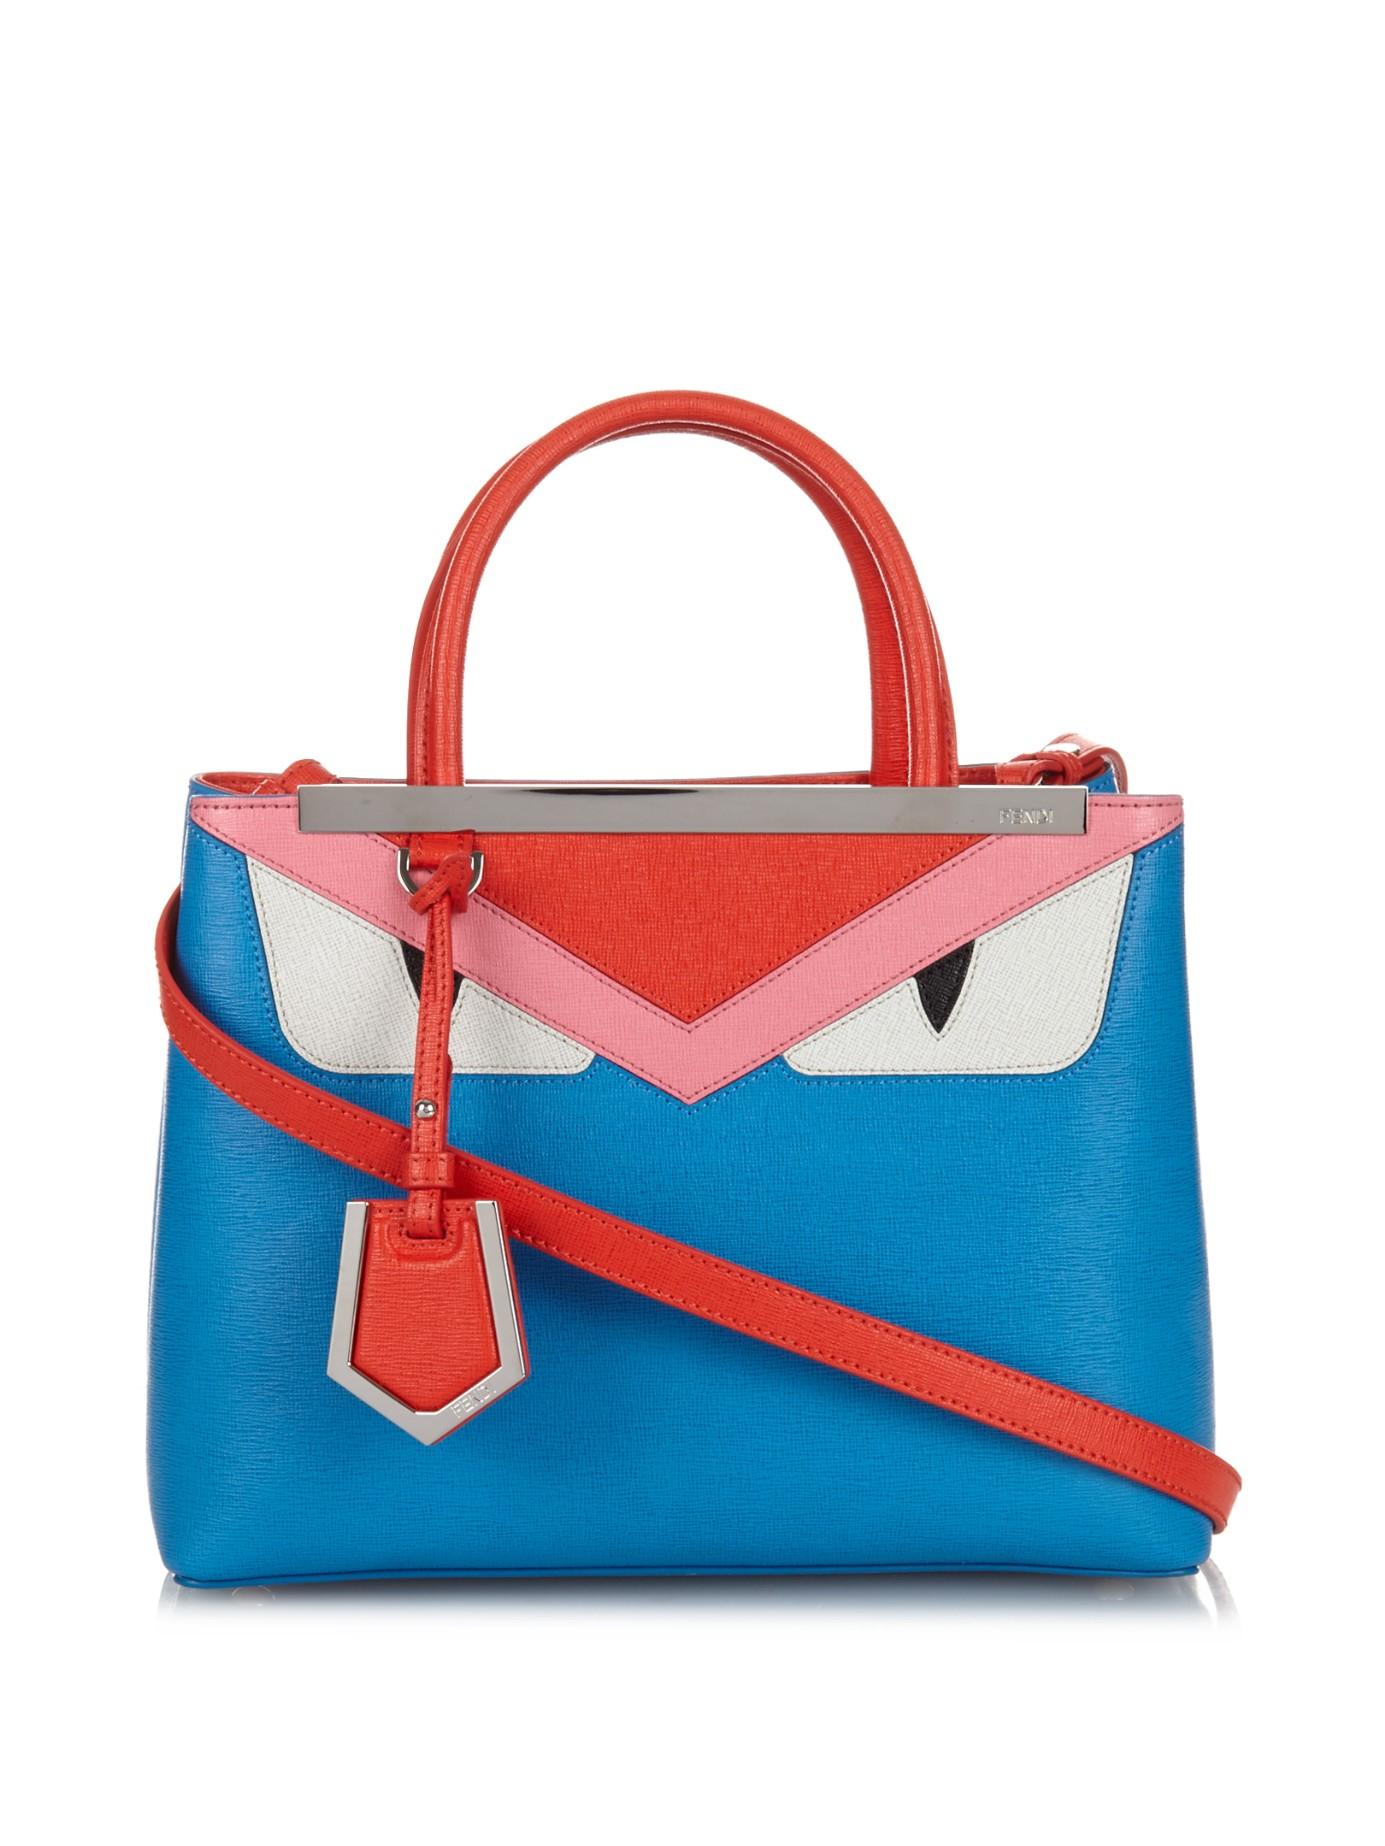 162a73079e Lyst - Fendi Petite 2Jours Bag Bugs Leather Cross-Body Bag in Blue